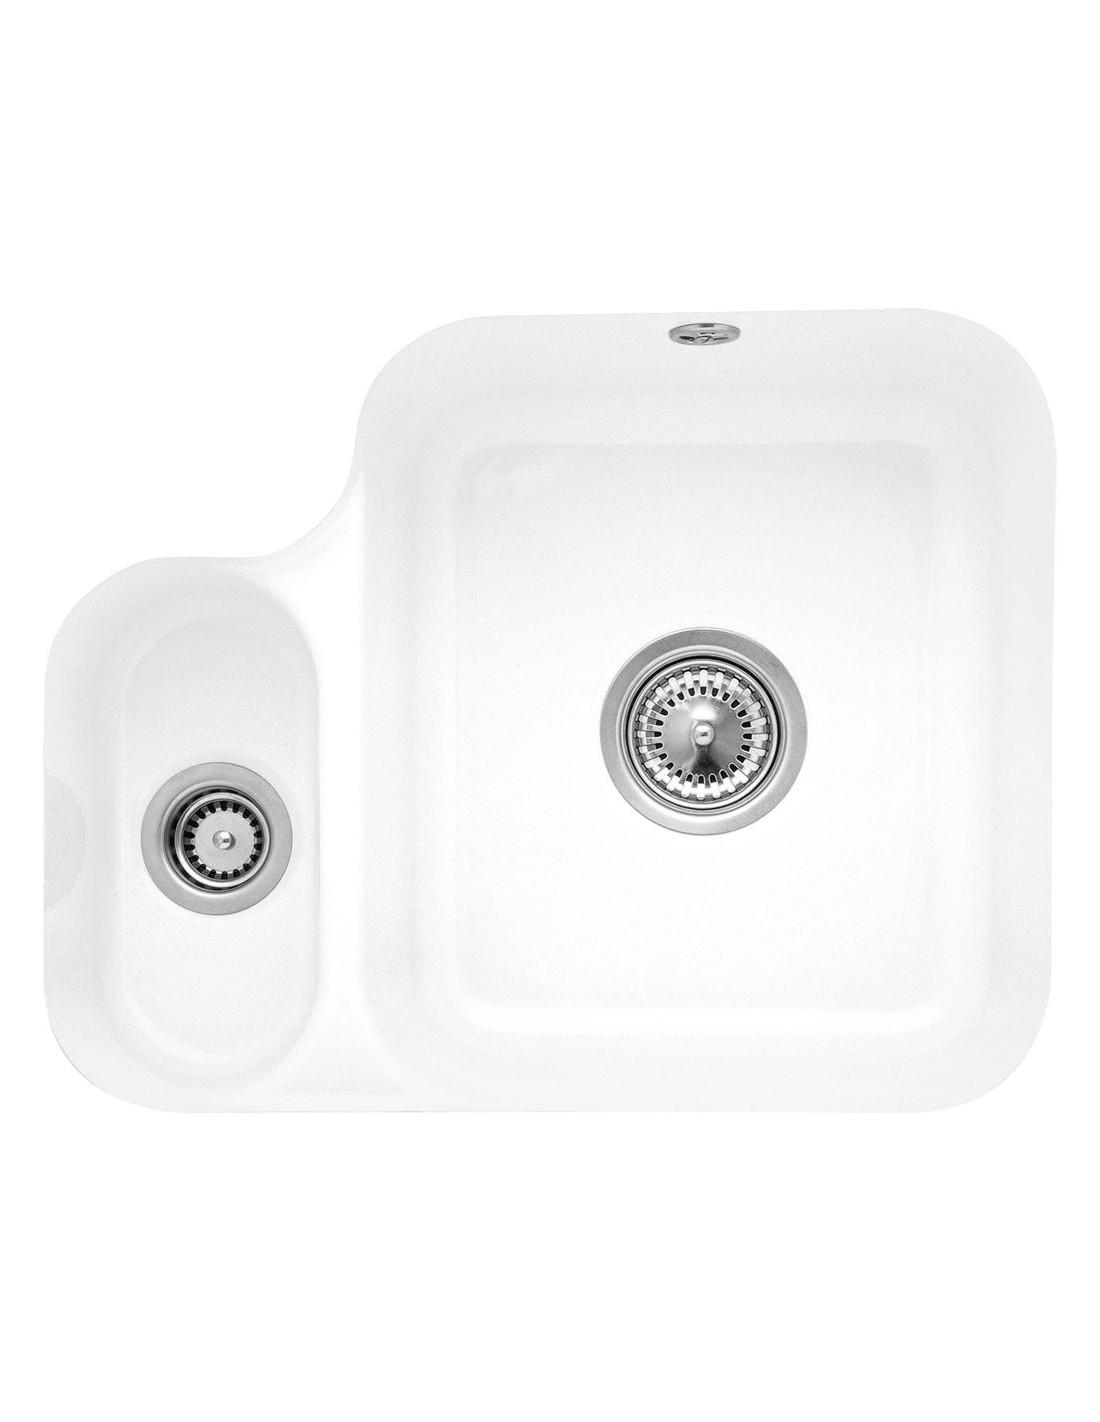 6702 Villeroy & Boch Cisterna Kitchen Sinks 1.0 & 1.5 Ceramic white ...